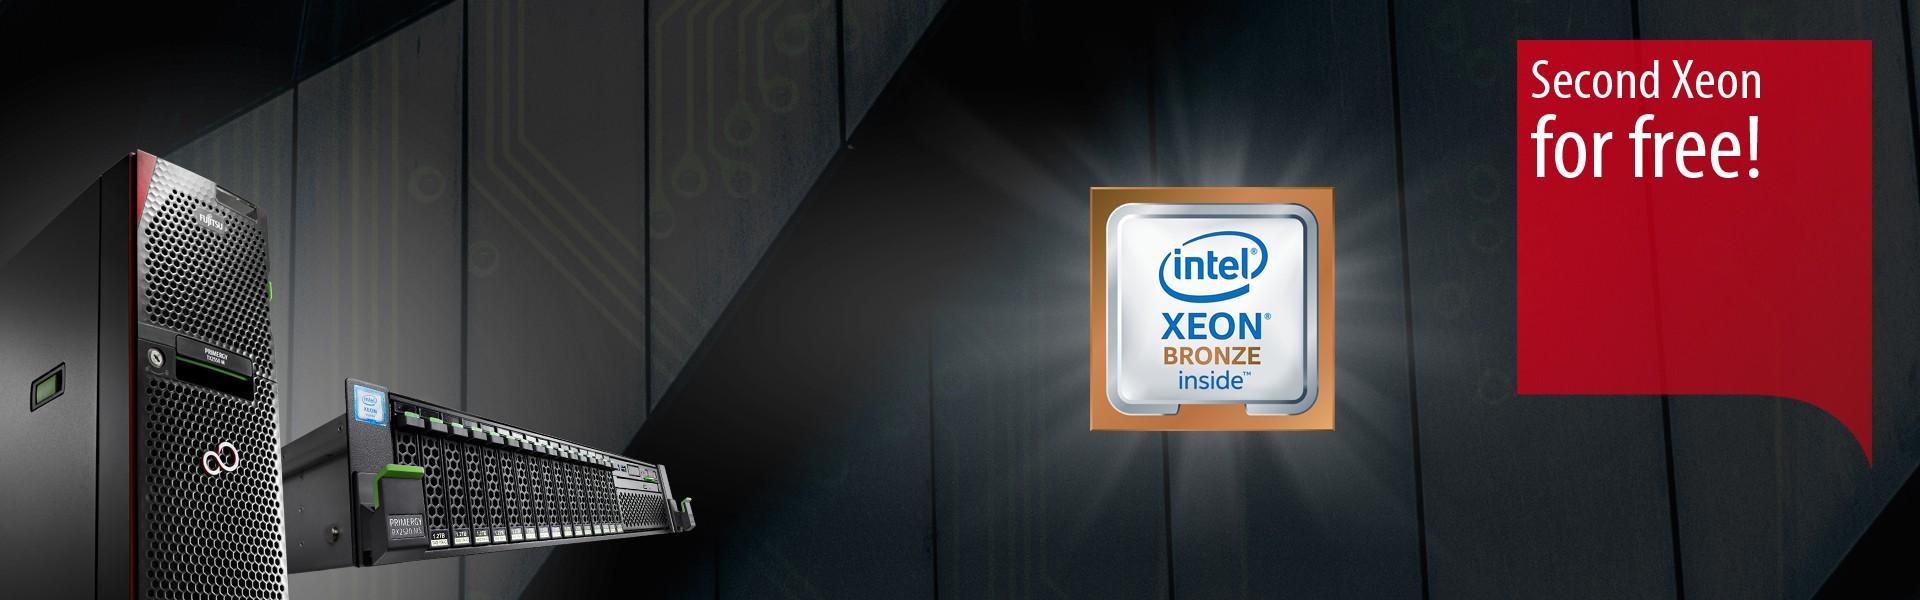 2nd Xeon